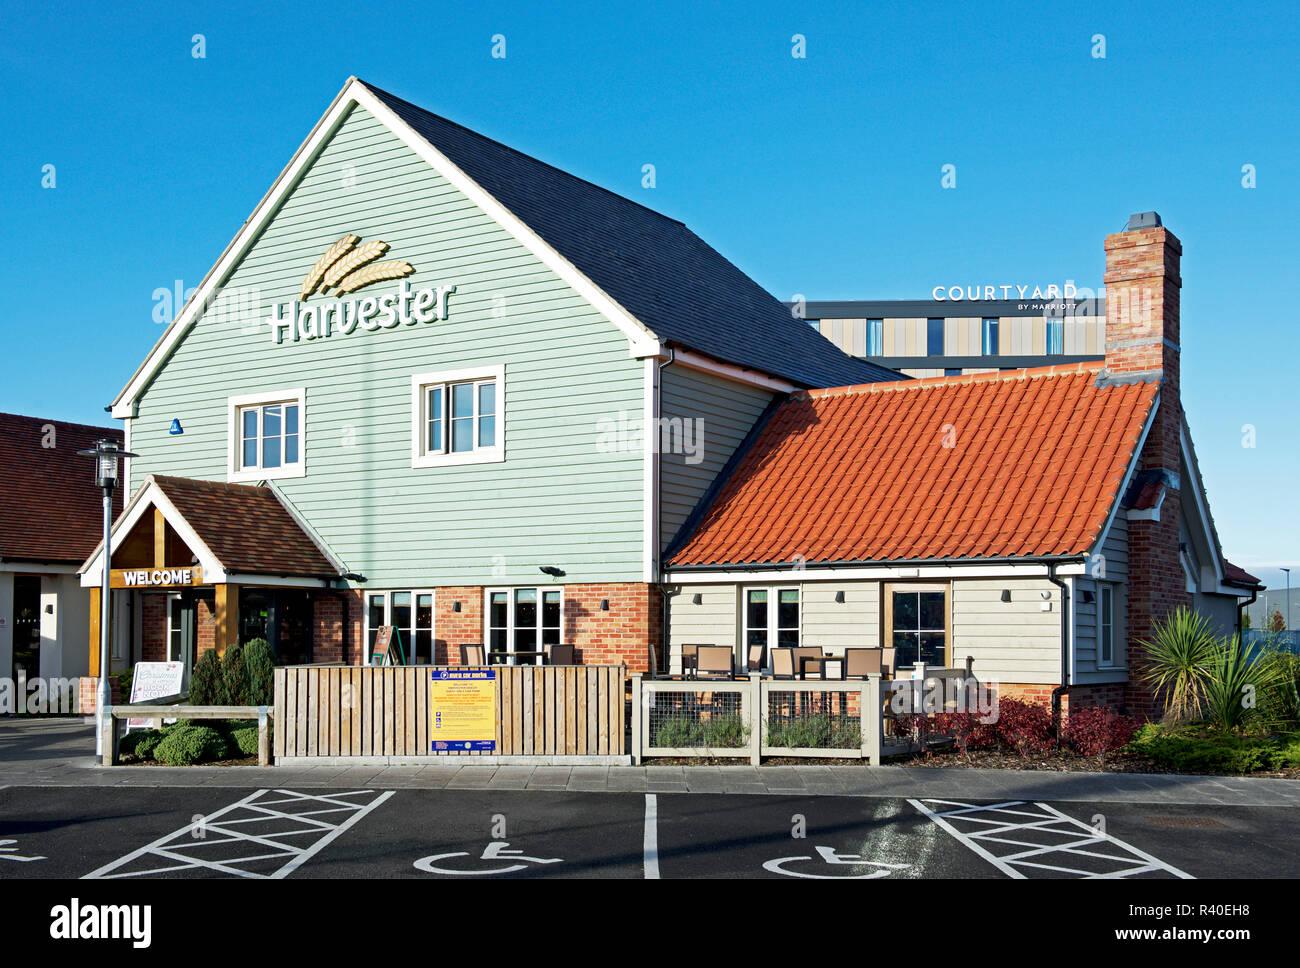 harvester-restaurant-didcot-oxfordshire-england-uk-R40EH8.jpg